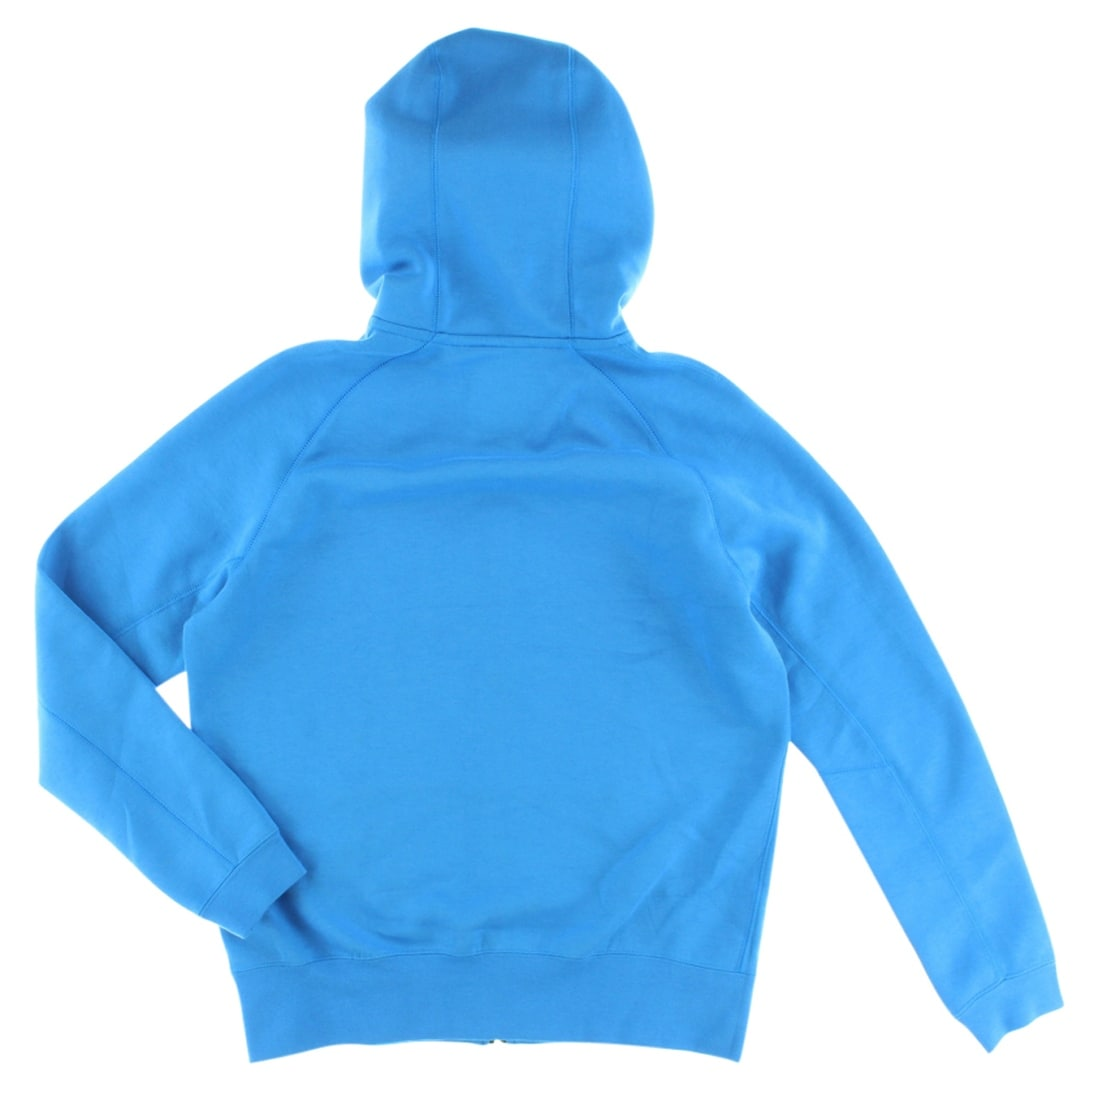 0a2035586 Shop Nike Mens Tech Fleece Full Zip Hoodie Blue - Blue/Black - XxL - Free  Shipping Today - Overstock - 22545204